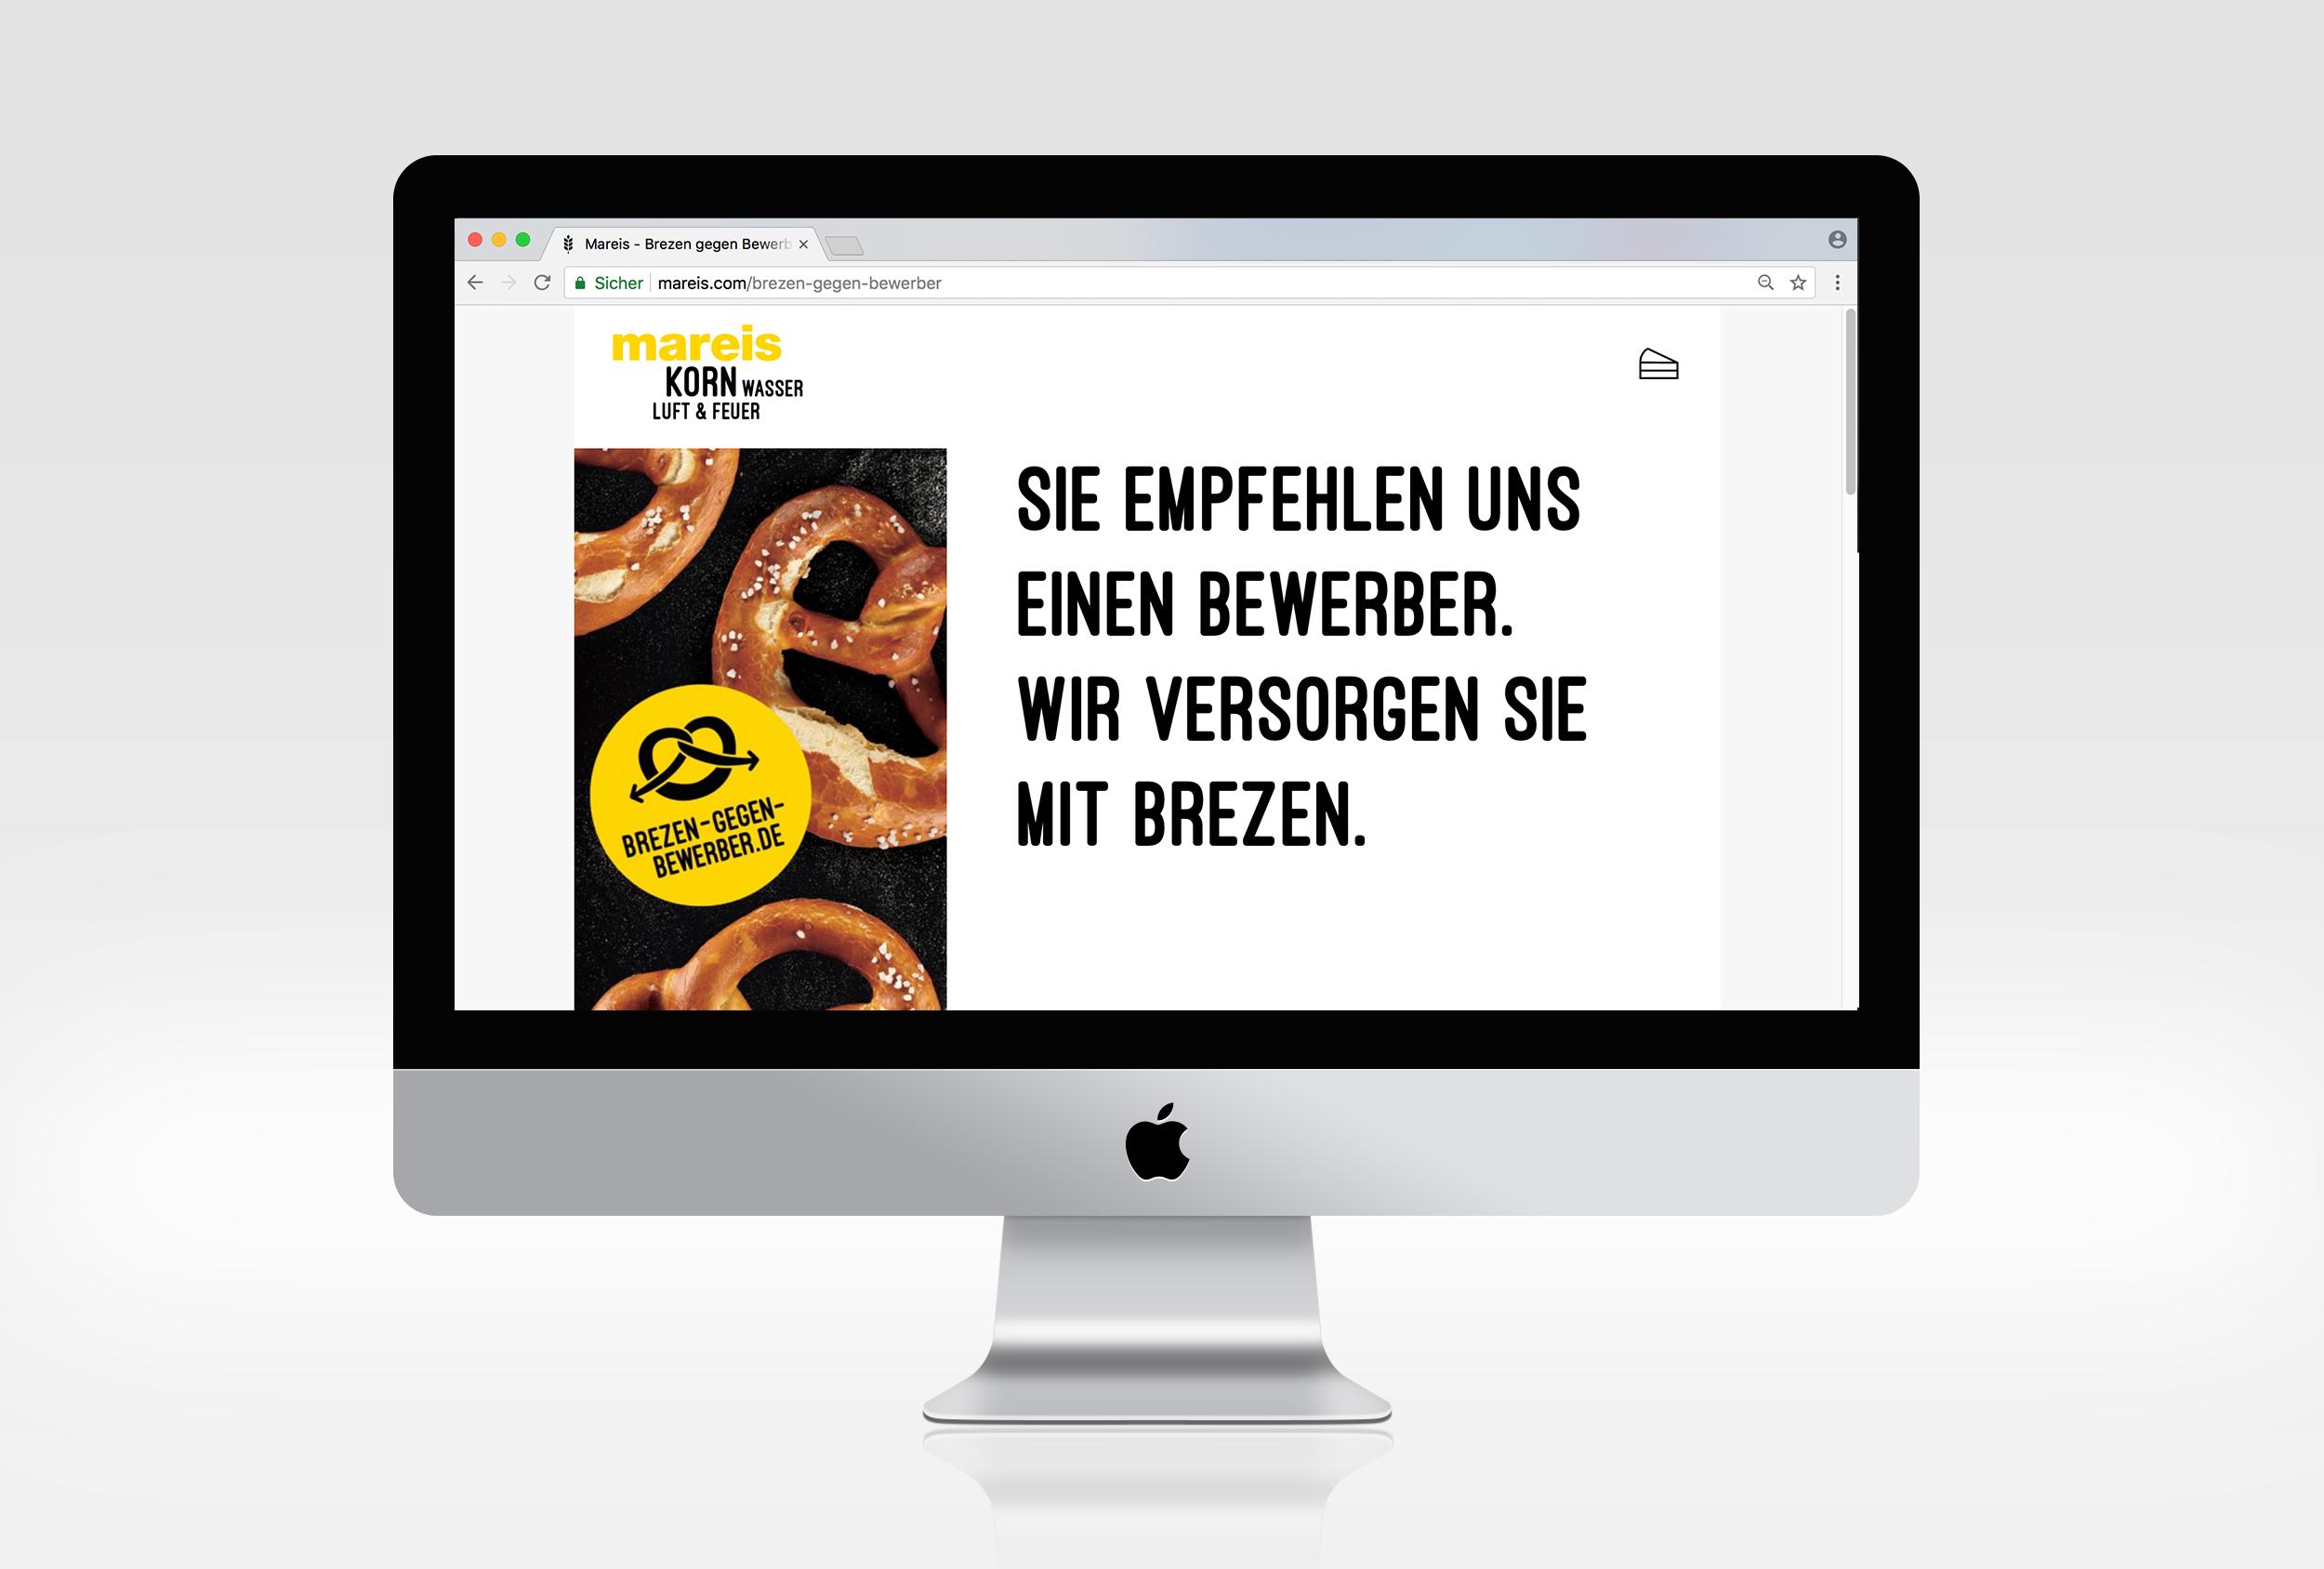 imac_kampagne